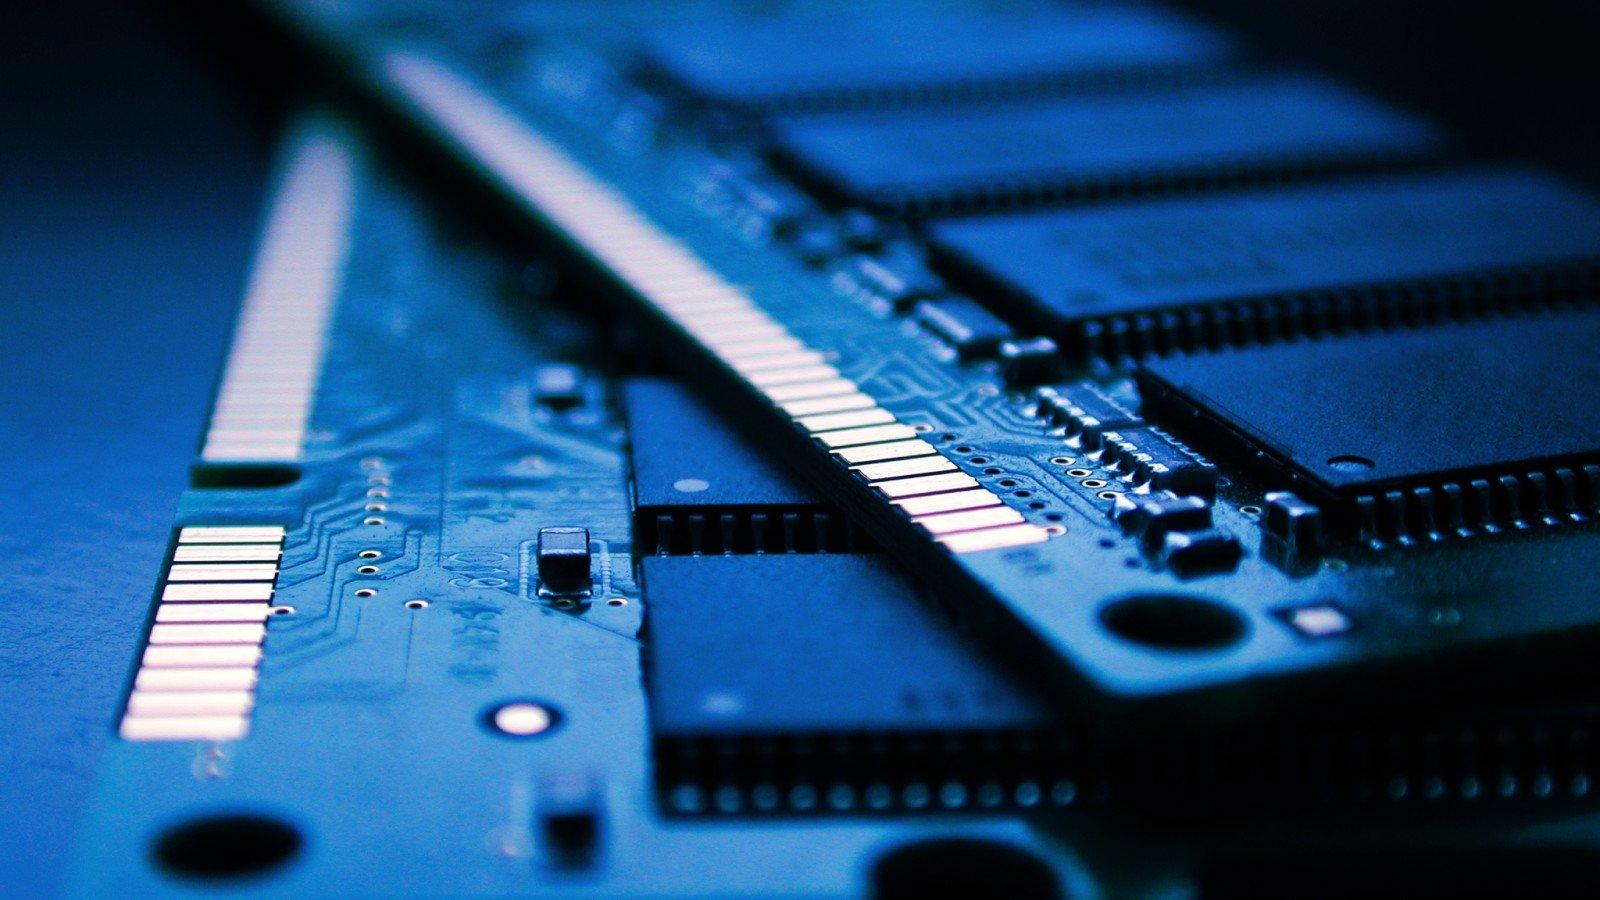 ram memory - Windows 10 Πώς να βρείτε τον τύπο μνήμης DDR